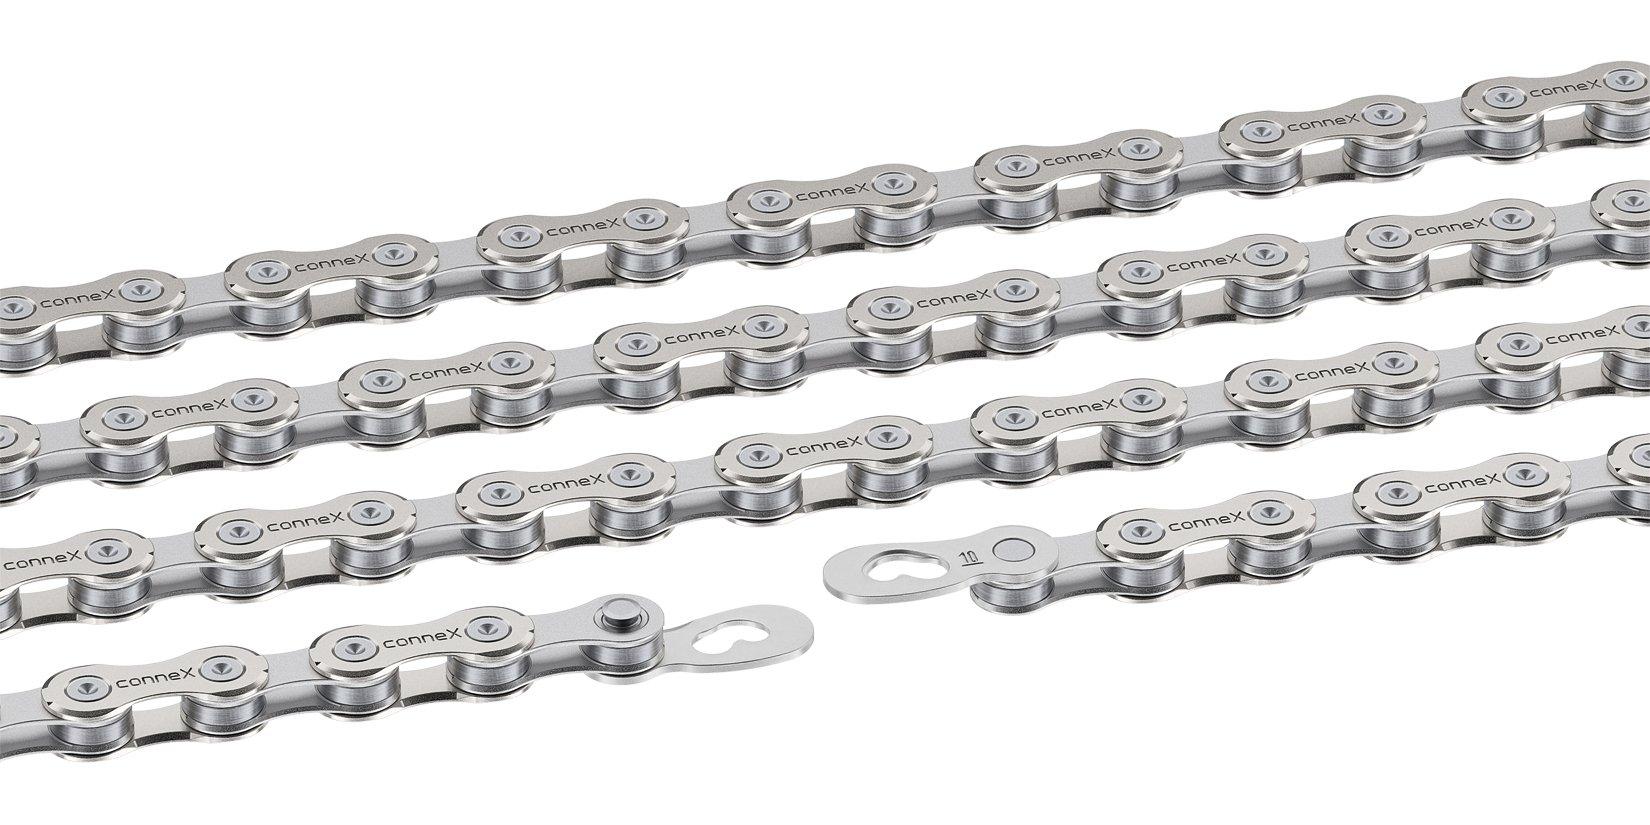 Wipperman Connex 10sX SS Chain (10-Speed)